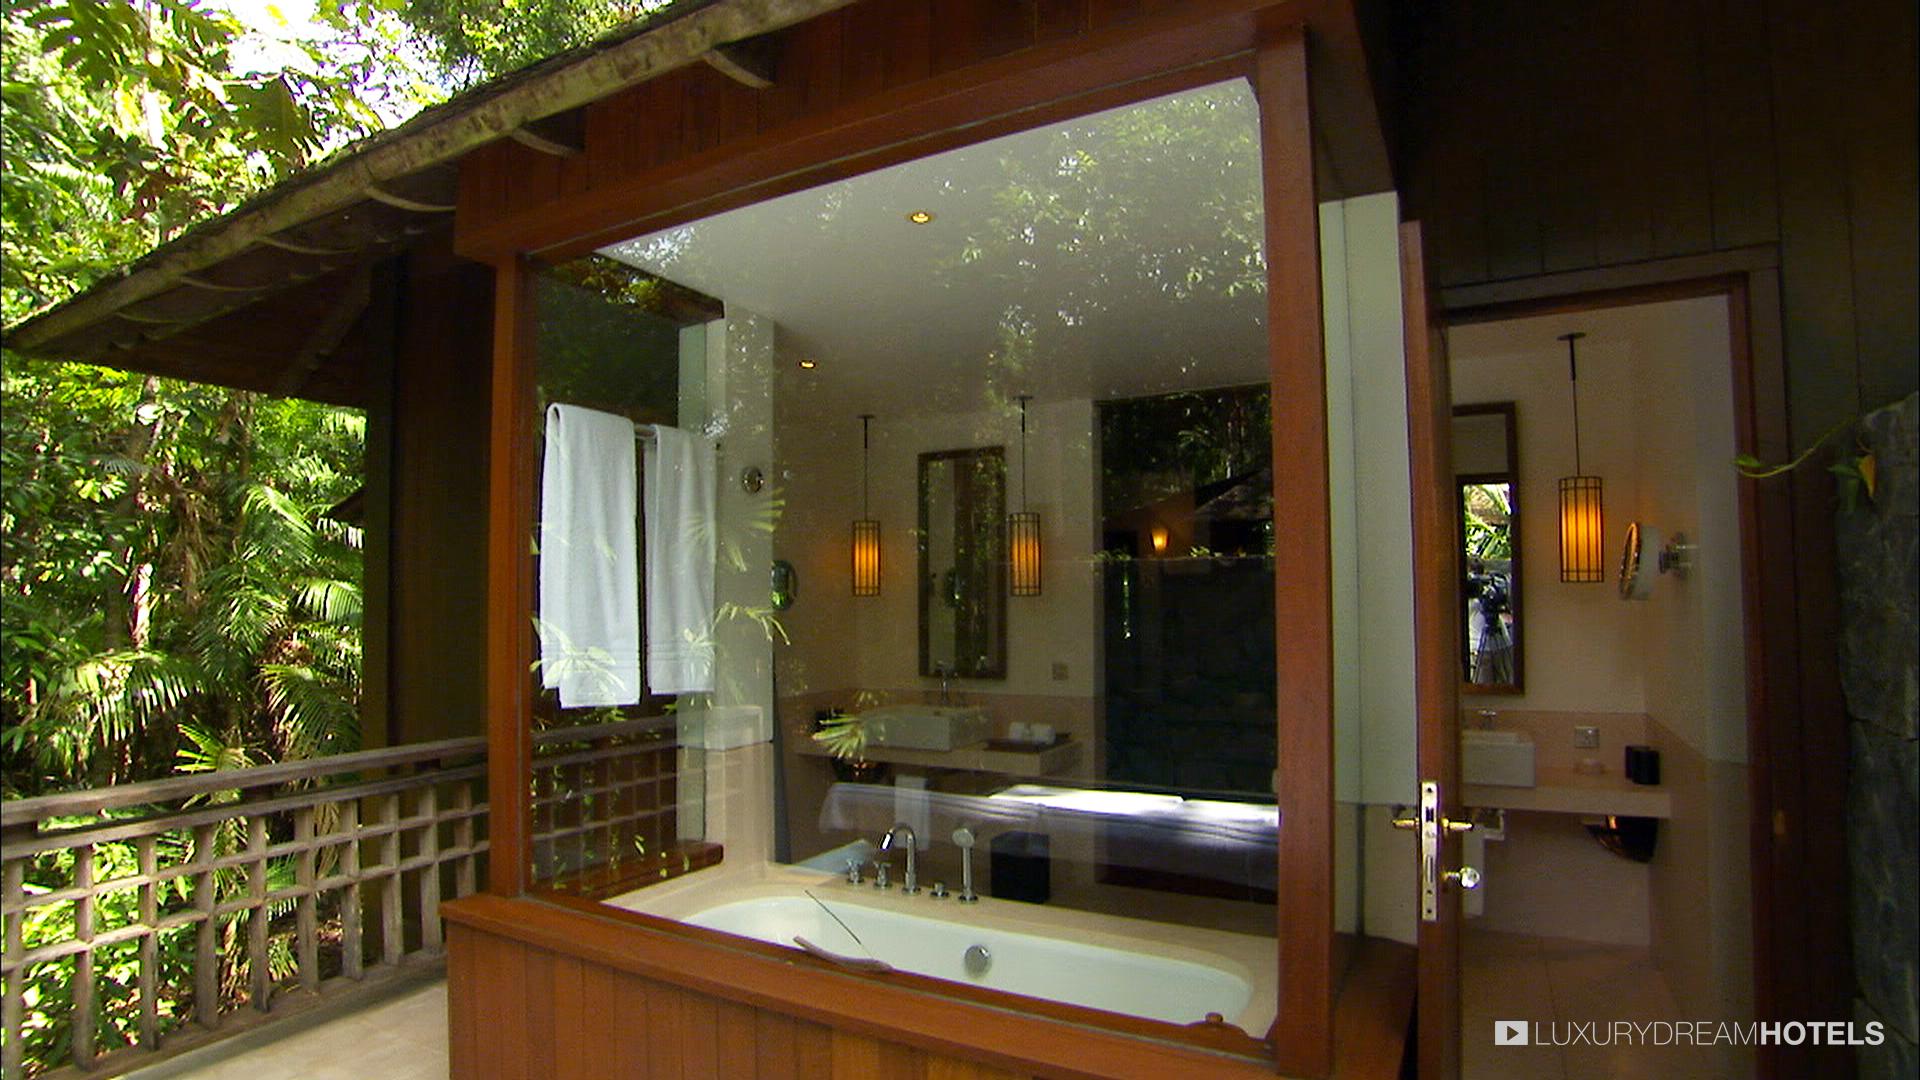 Luxury hotel the datai langkawi kampung padang masirat malaysia luxury dream hotels